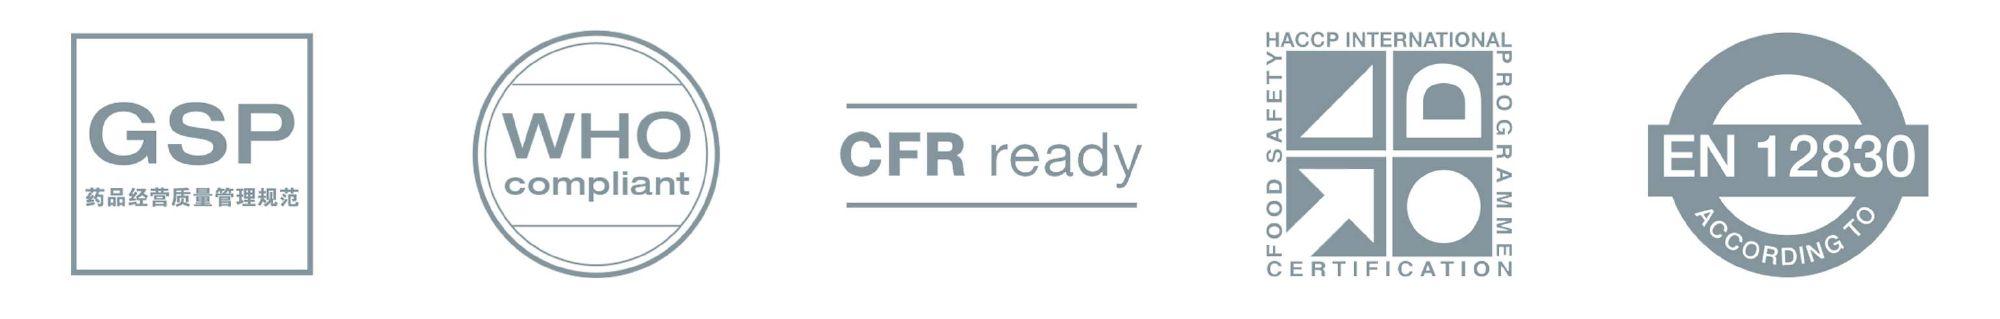 WHO、FDA 21 CFR Part11、GxP等食品和药品运输的规范对疫苗冷链温控有着具体的法规要求。满足相关法规要求,确保疫苗的安全性,疫苗运输和储存必须有成熟的冷链系统支撑。